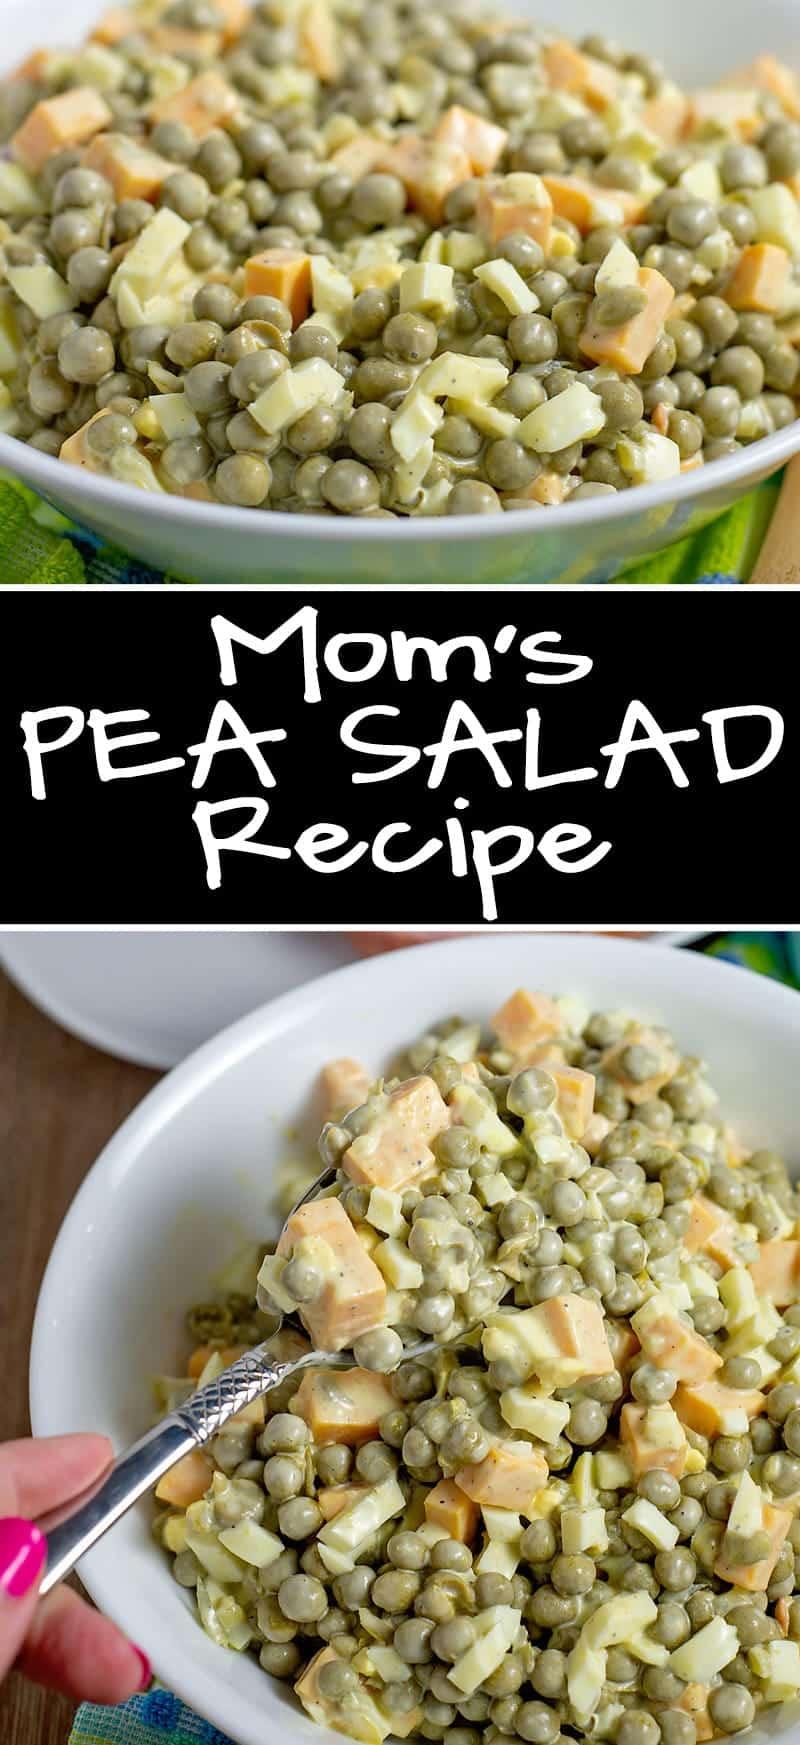 Easy Pea Salad Recipe, Just like Mom used to make it